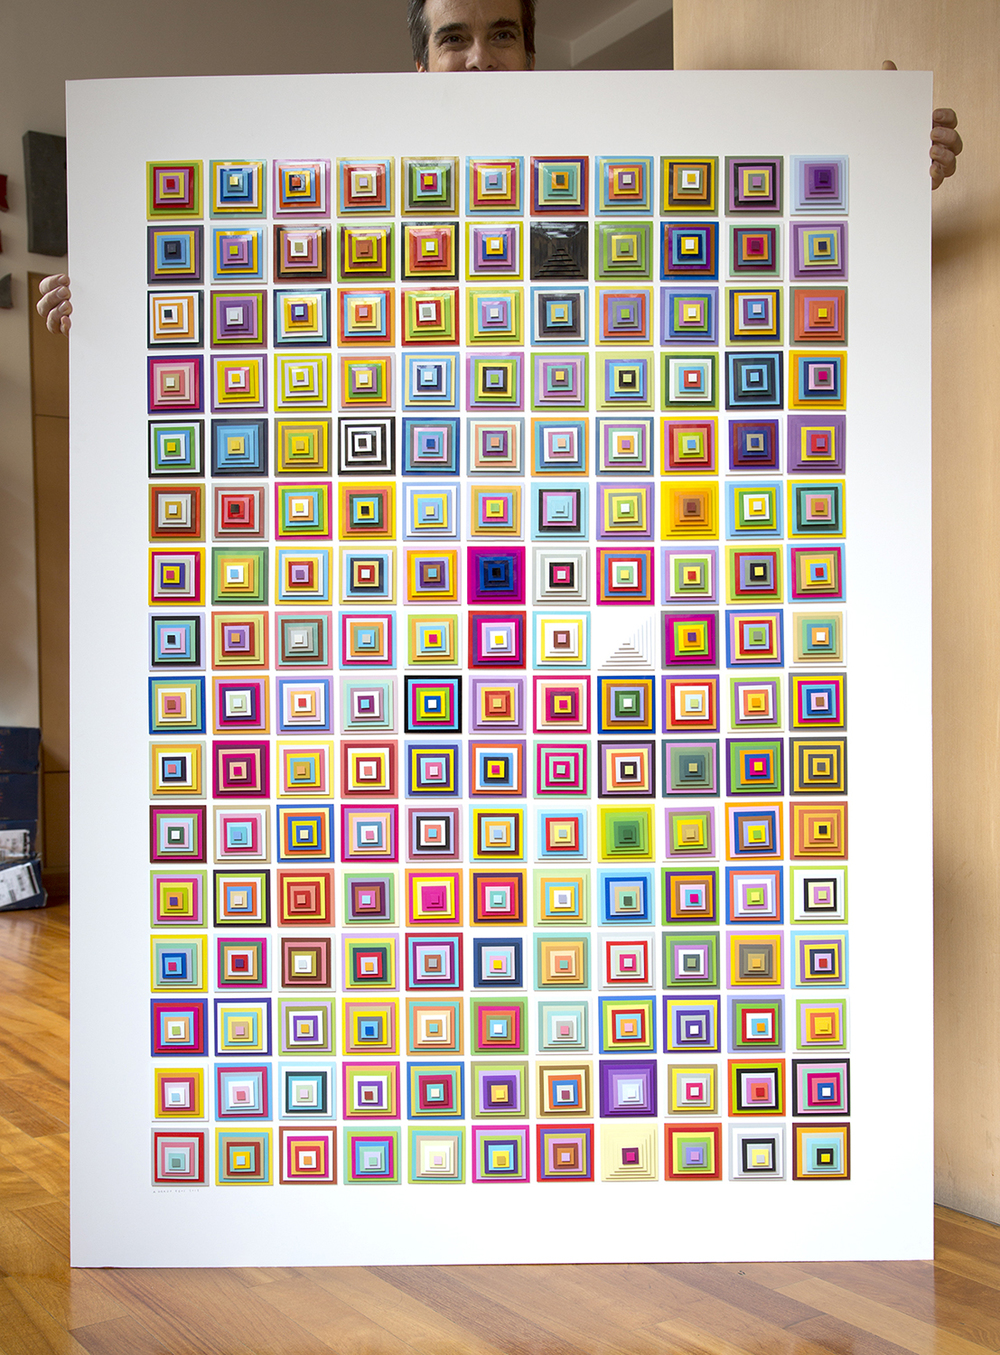 176 ziggurat+autore.jpg